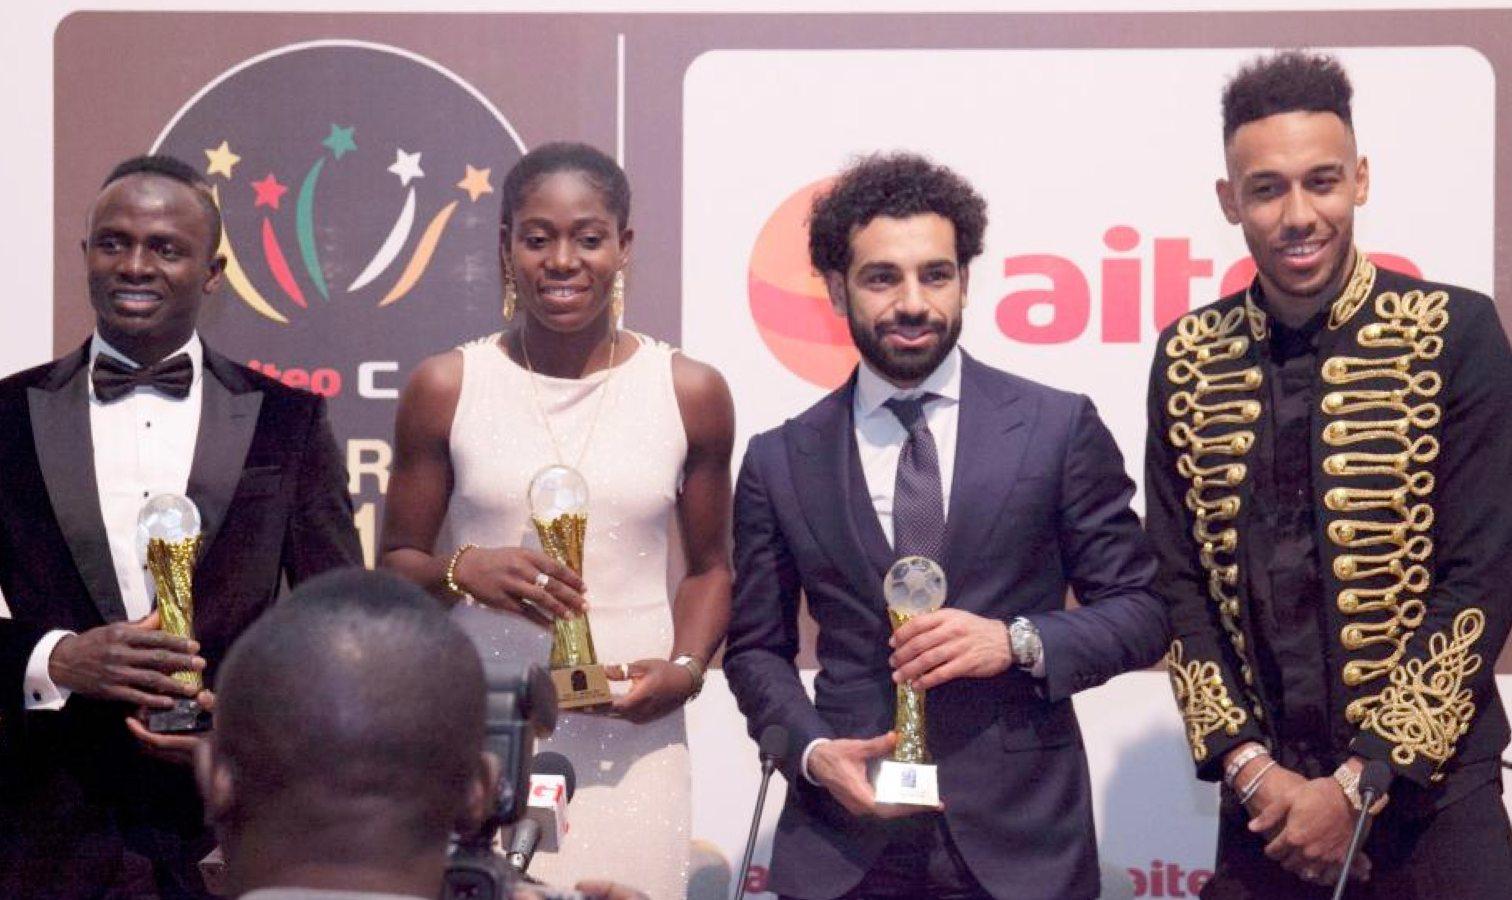 sadio mane aubameyang salah caf 2017 awards